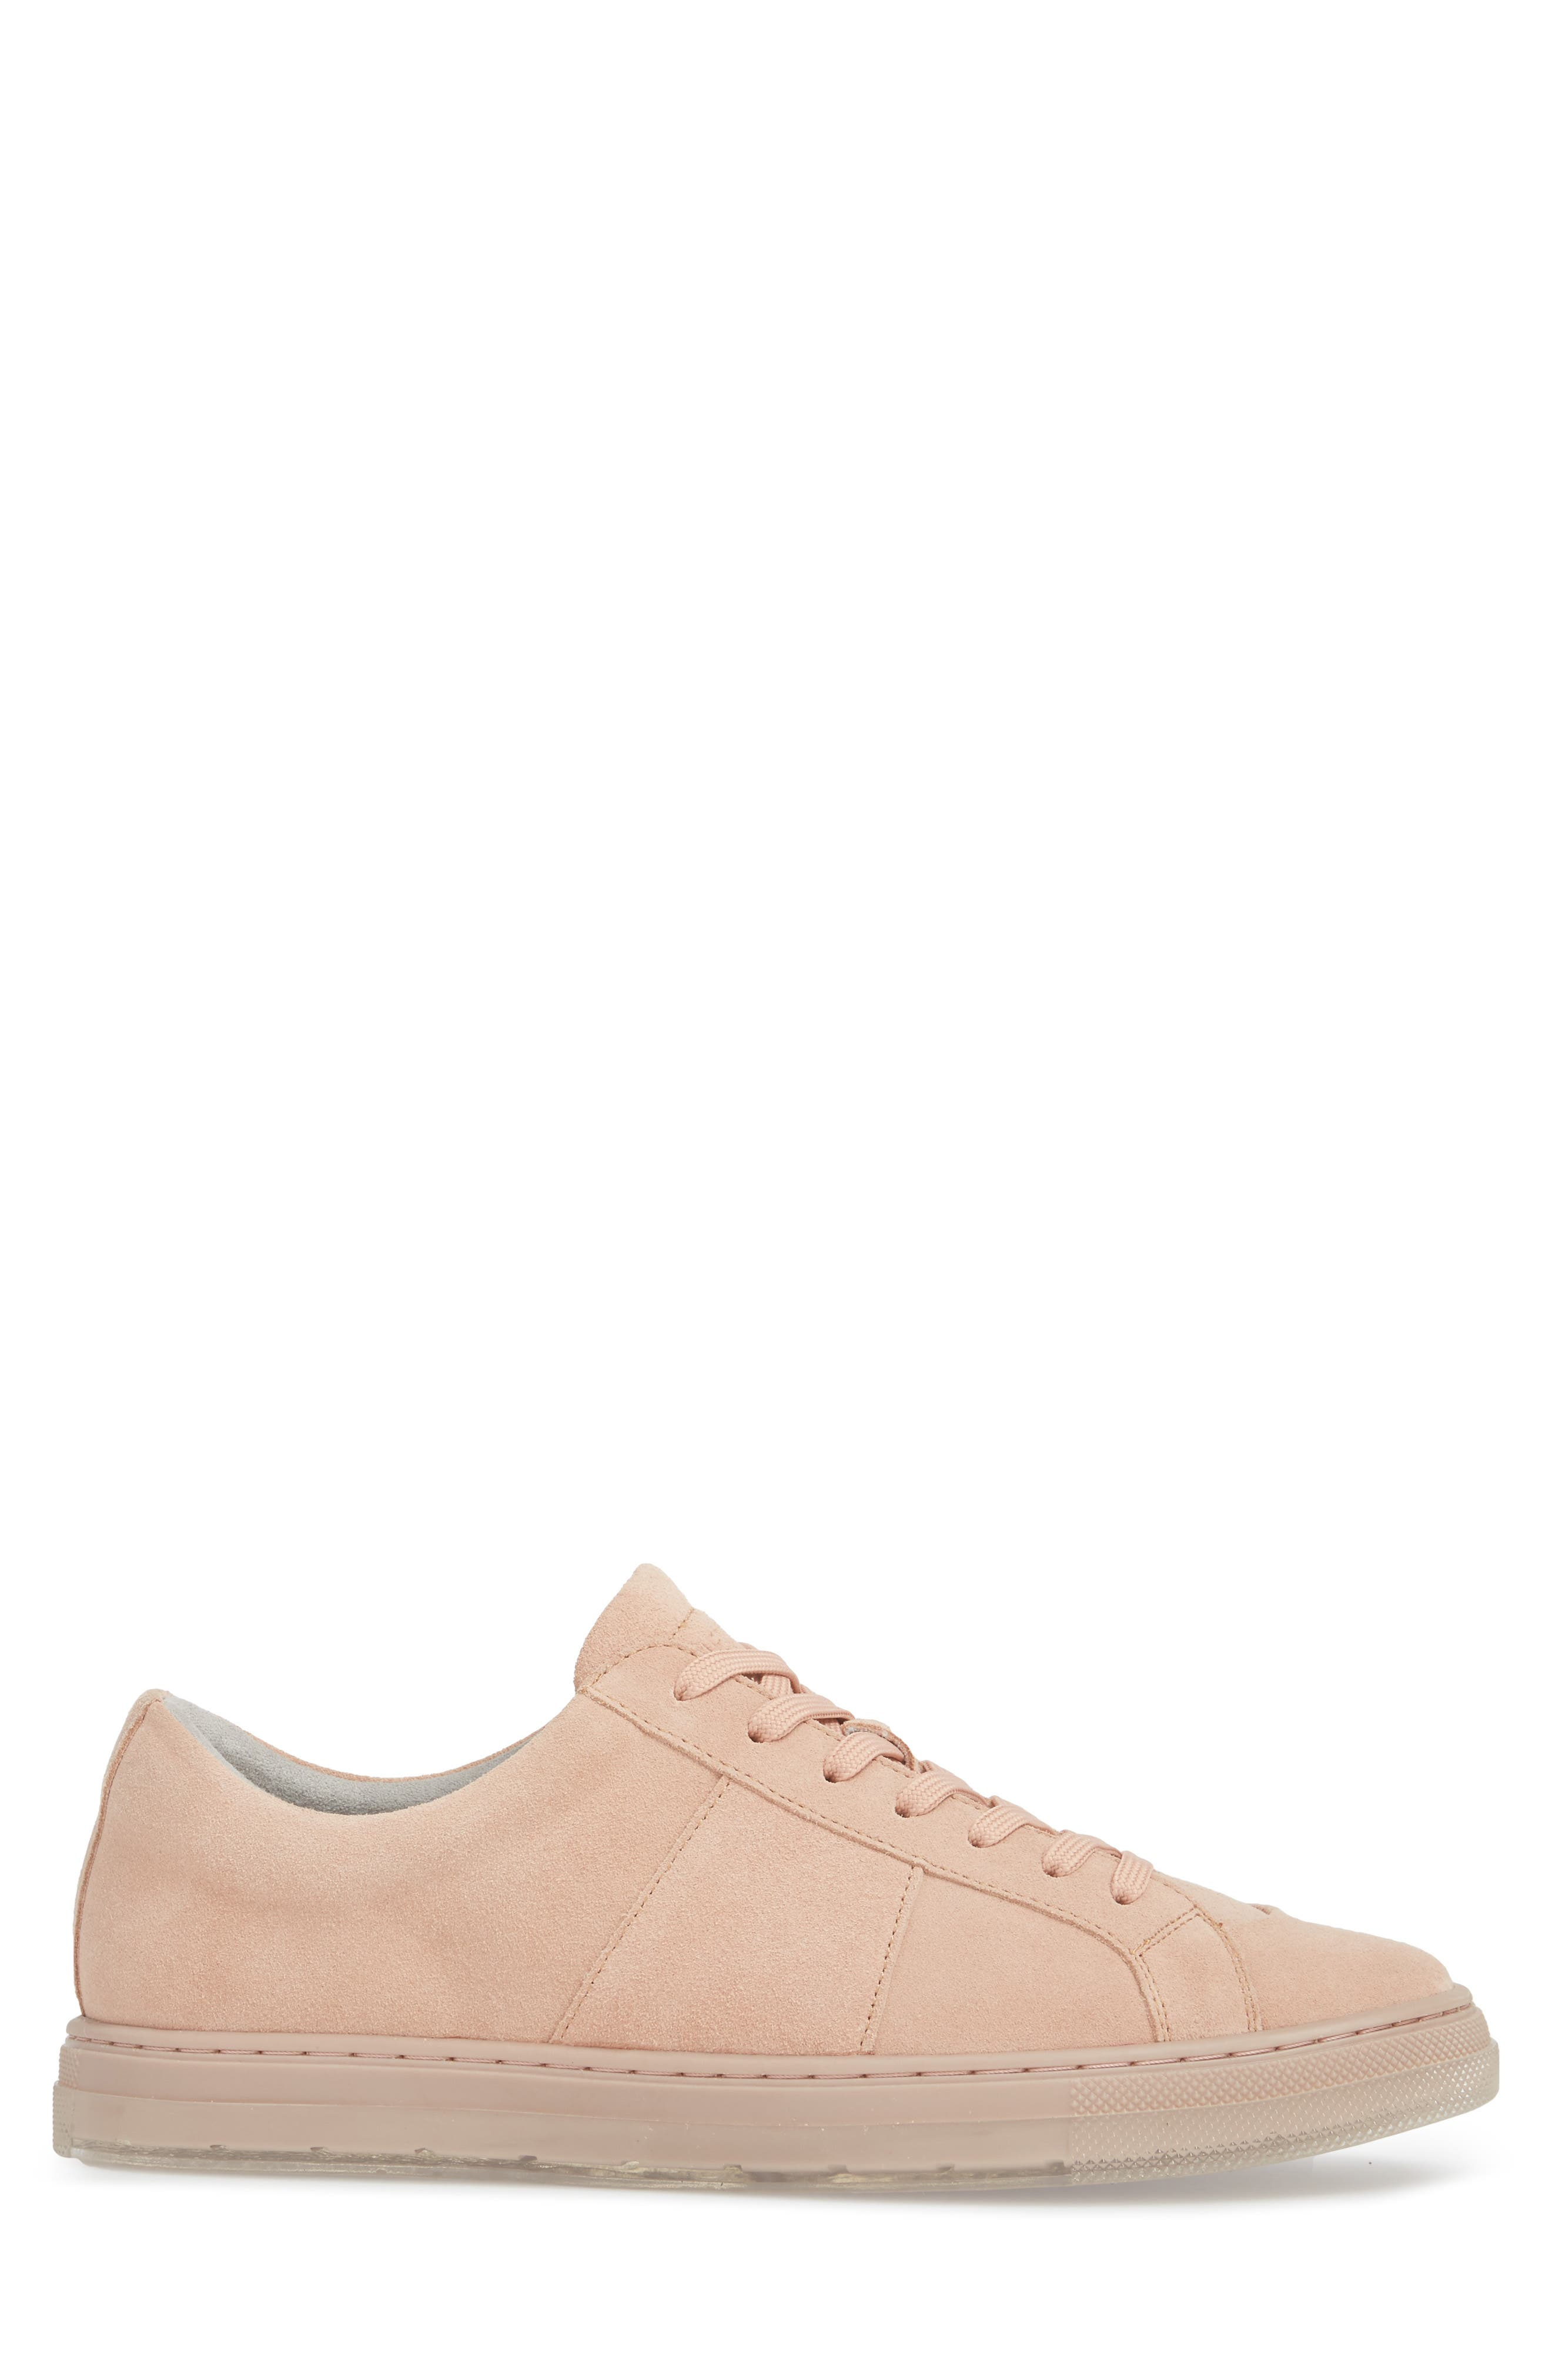 Colvin Sneaker,                             Alternate thumbnail 3, color,                             Rose Suede